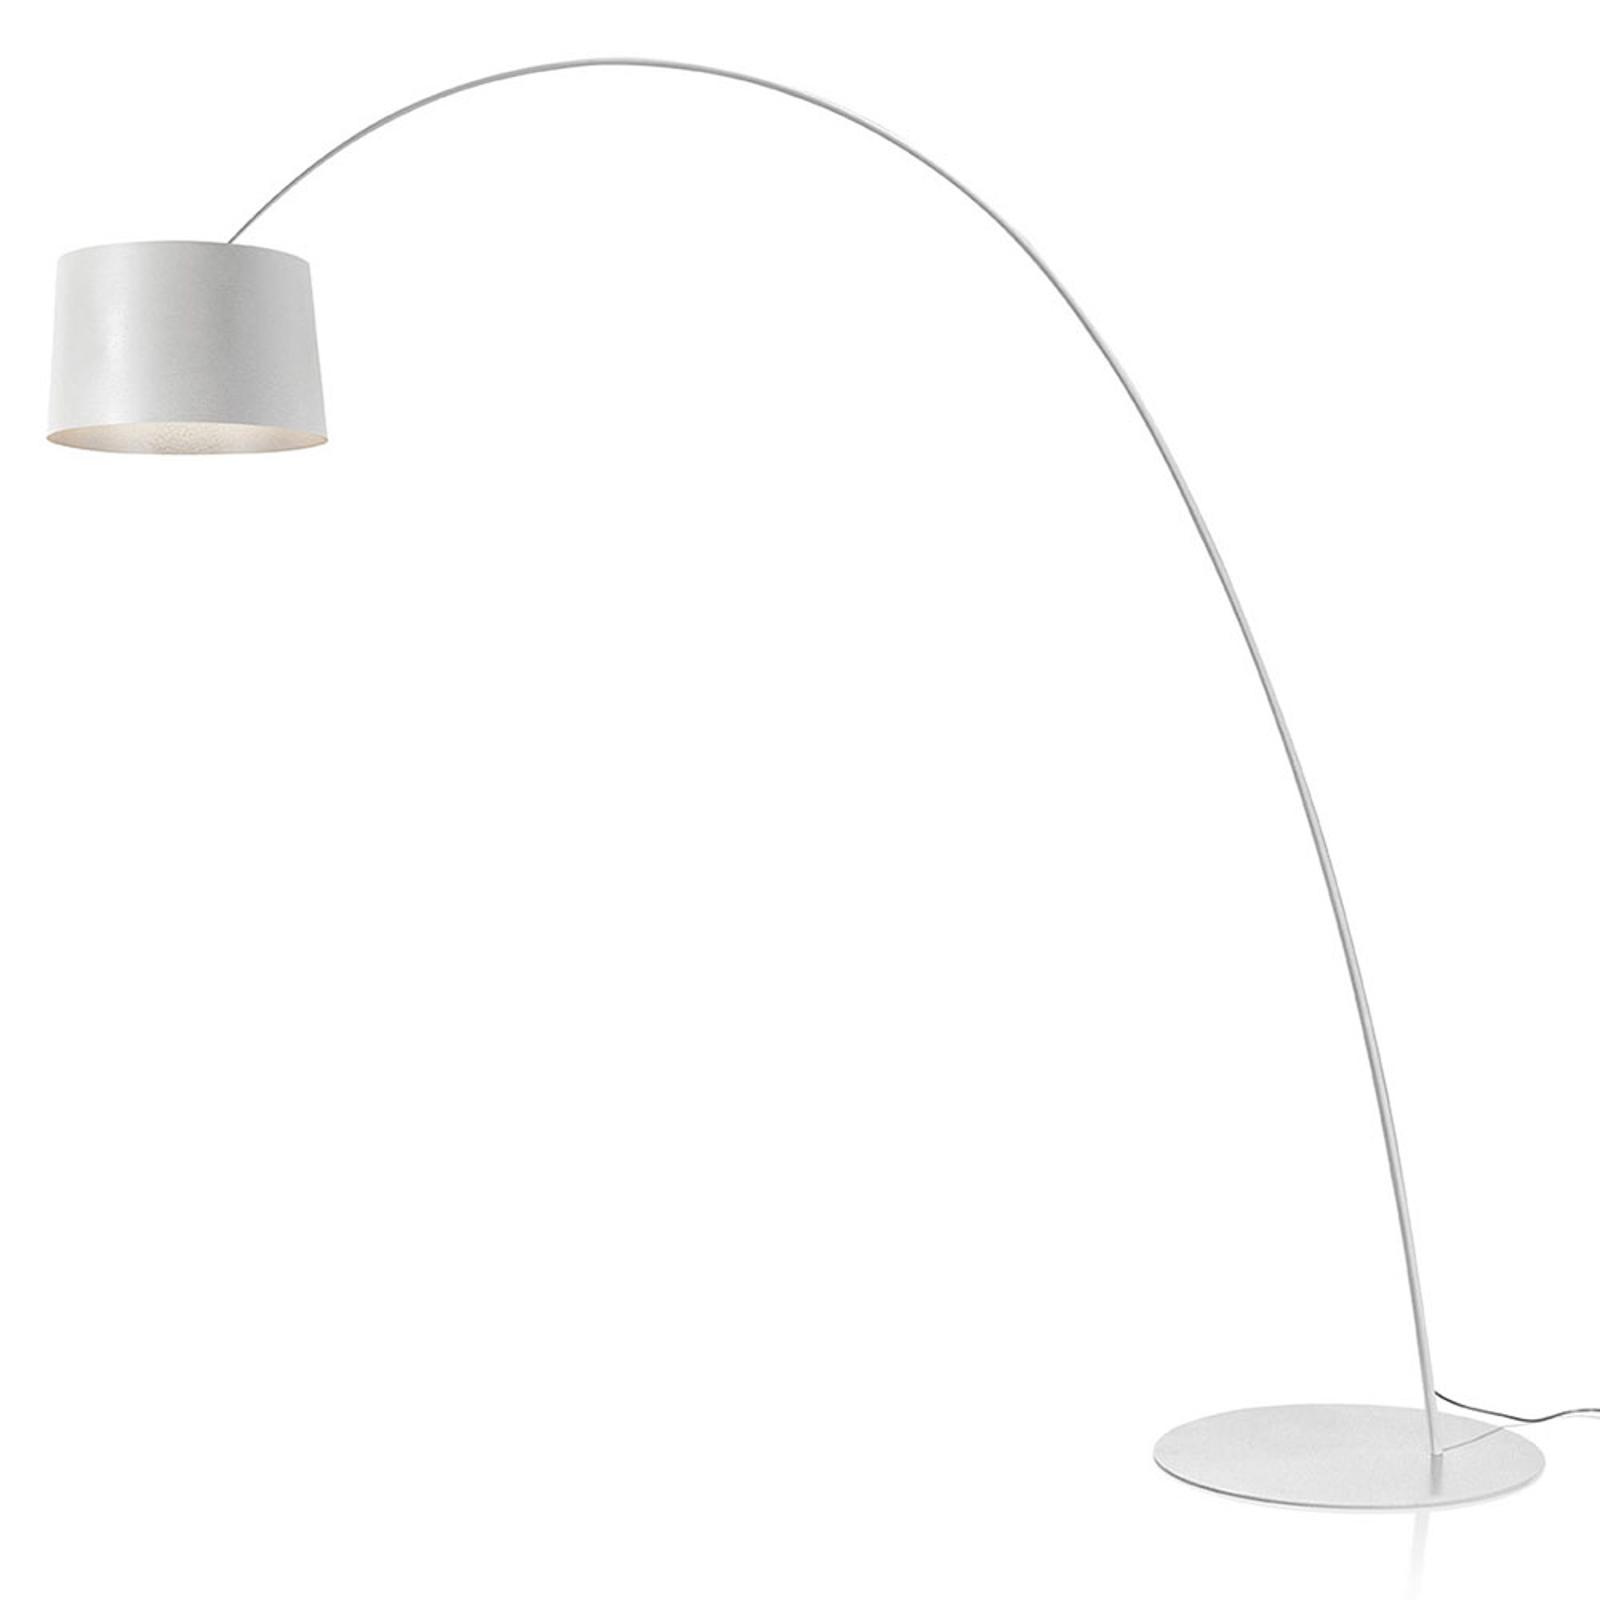 Foscarini Twiggy MyLight LED-golvlampa vit